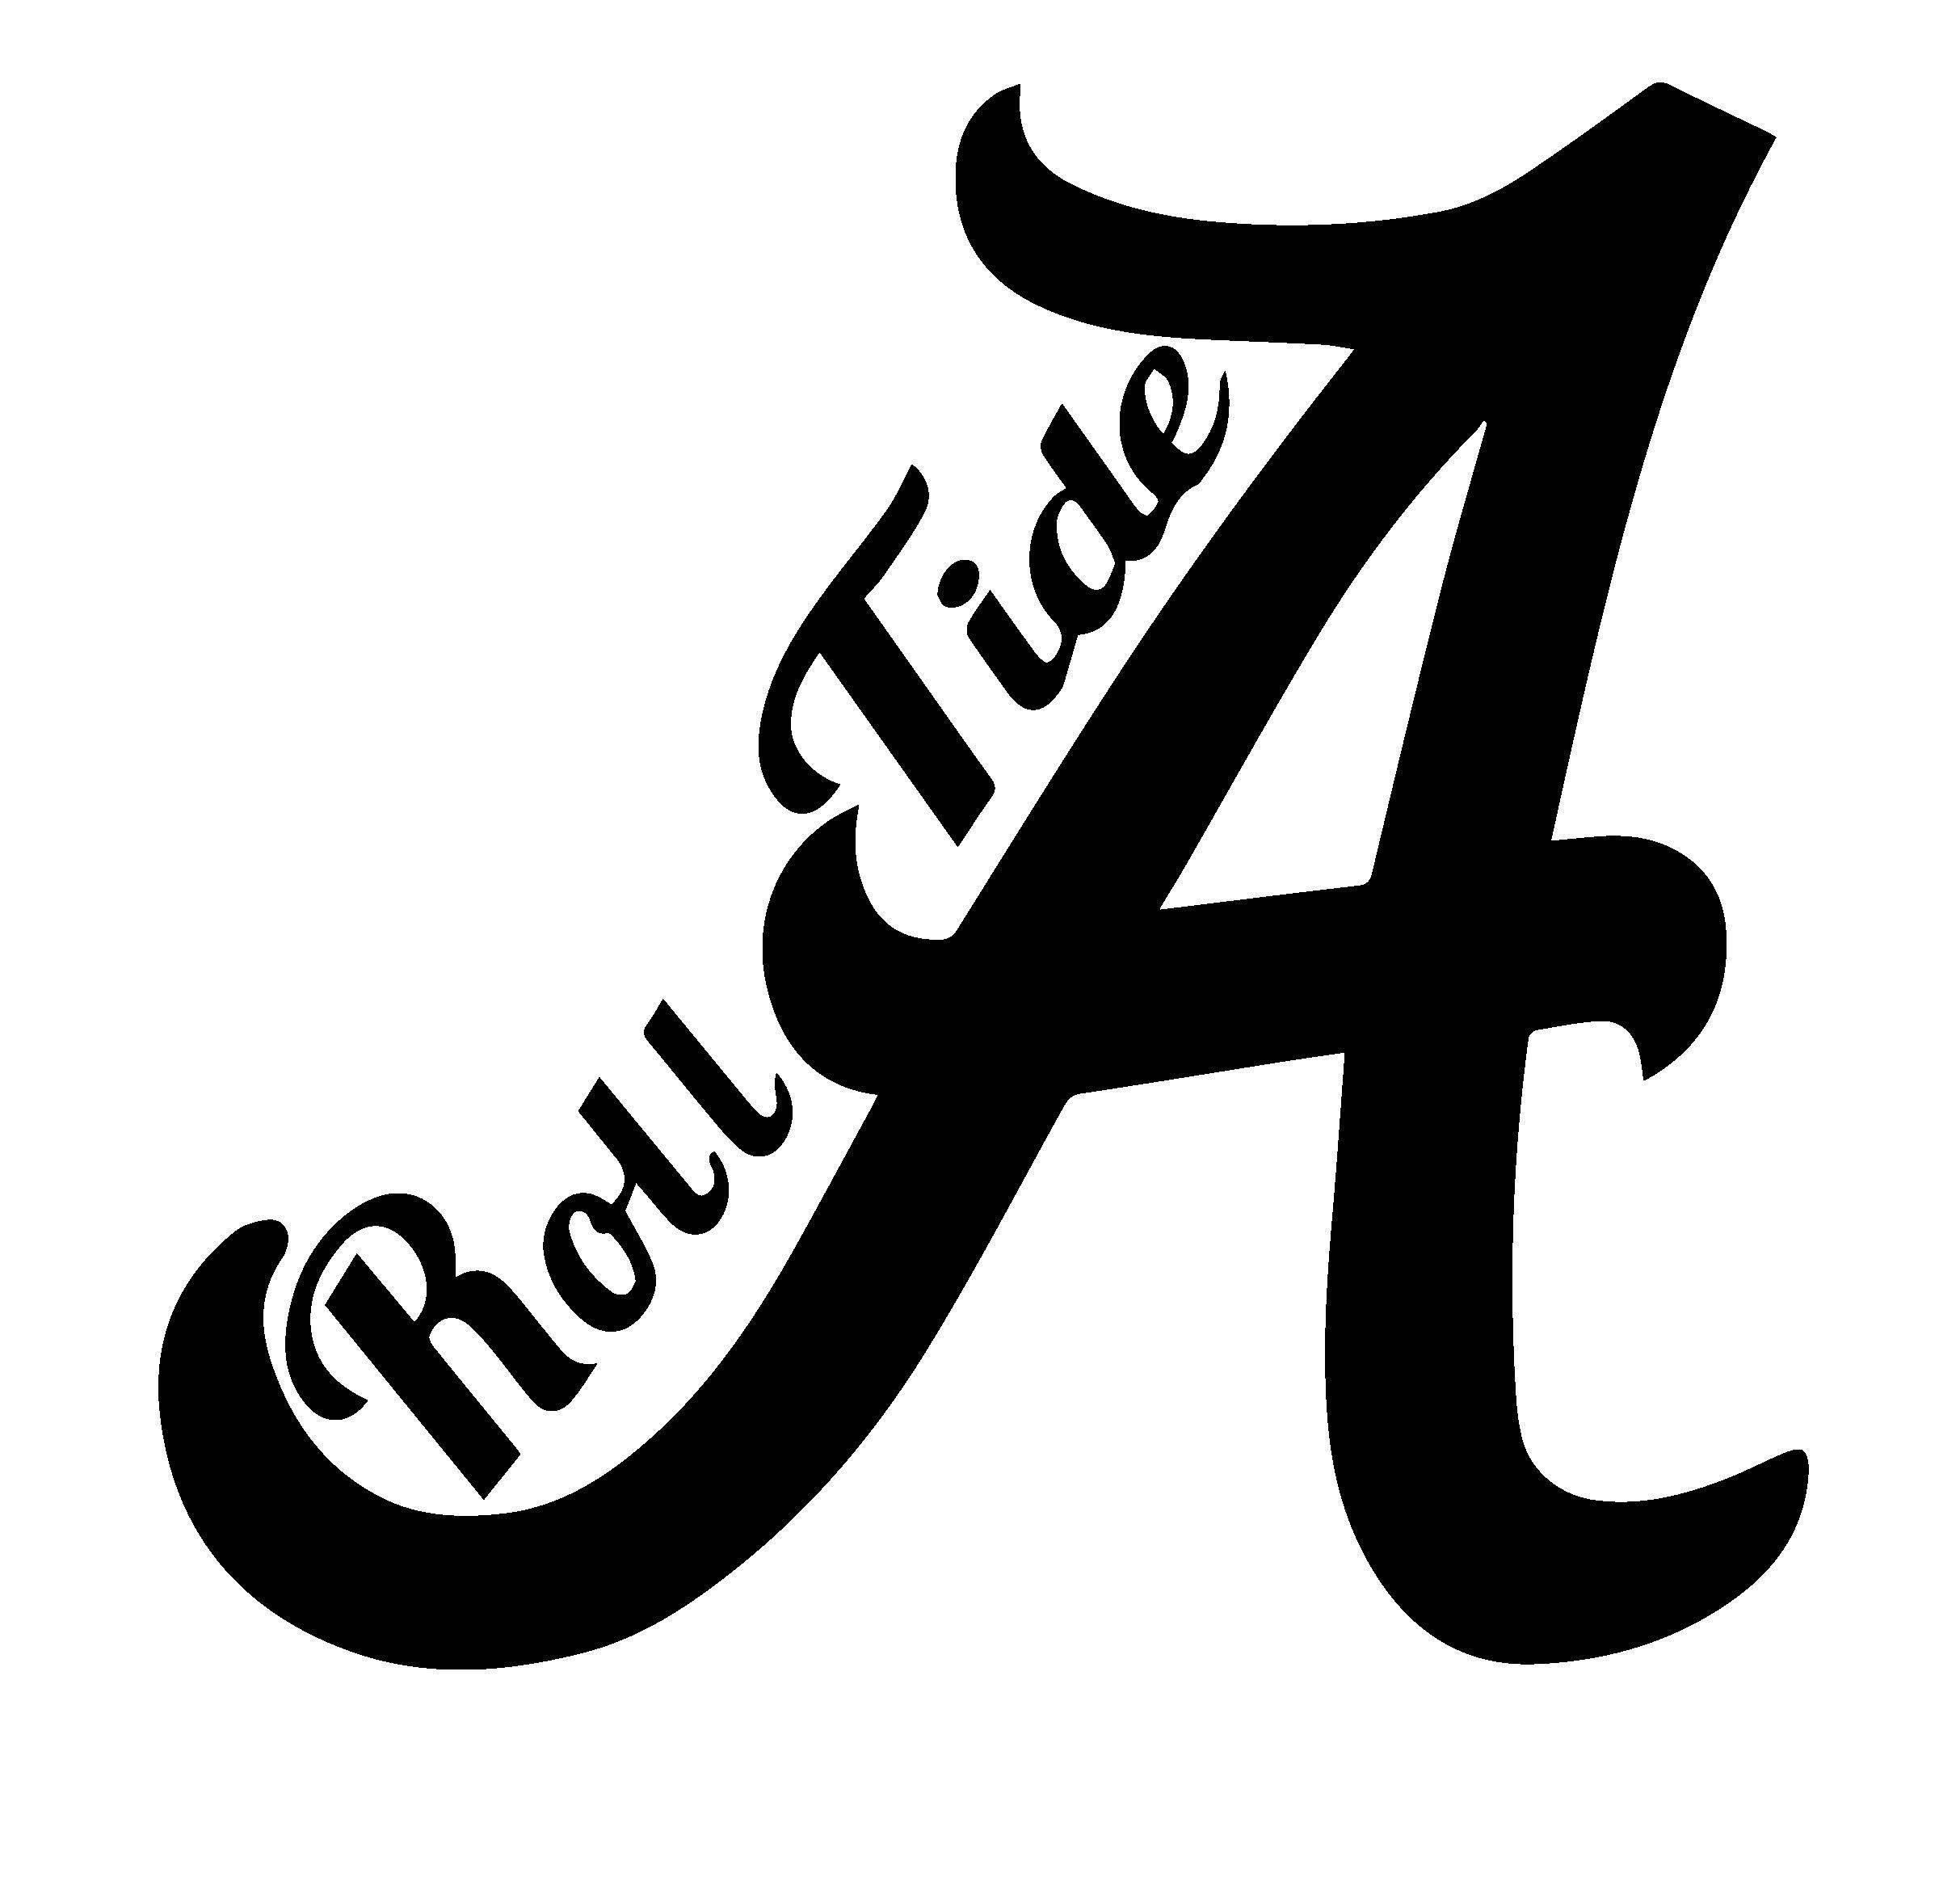 Alabama Clipart Crimson Tide Alabama, Alabama Crimson Tide